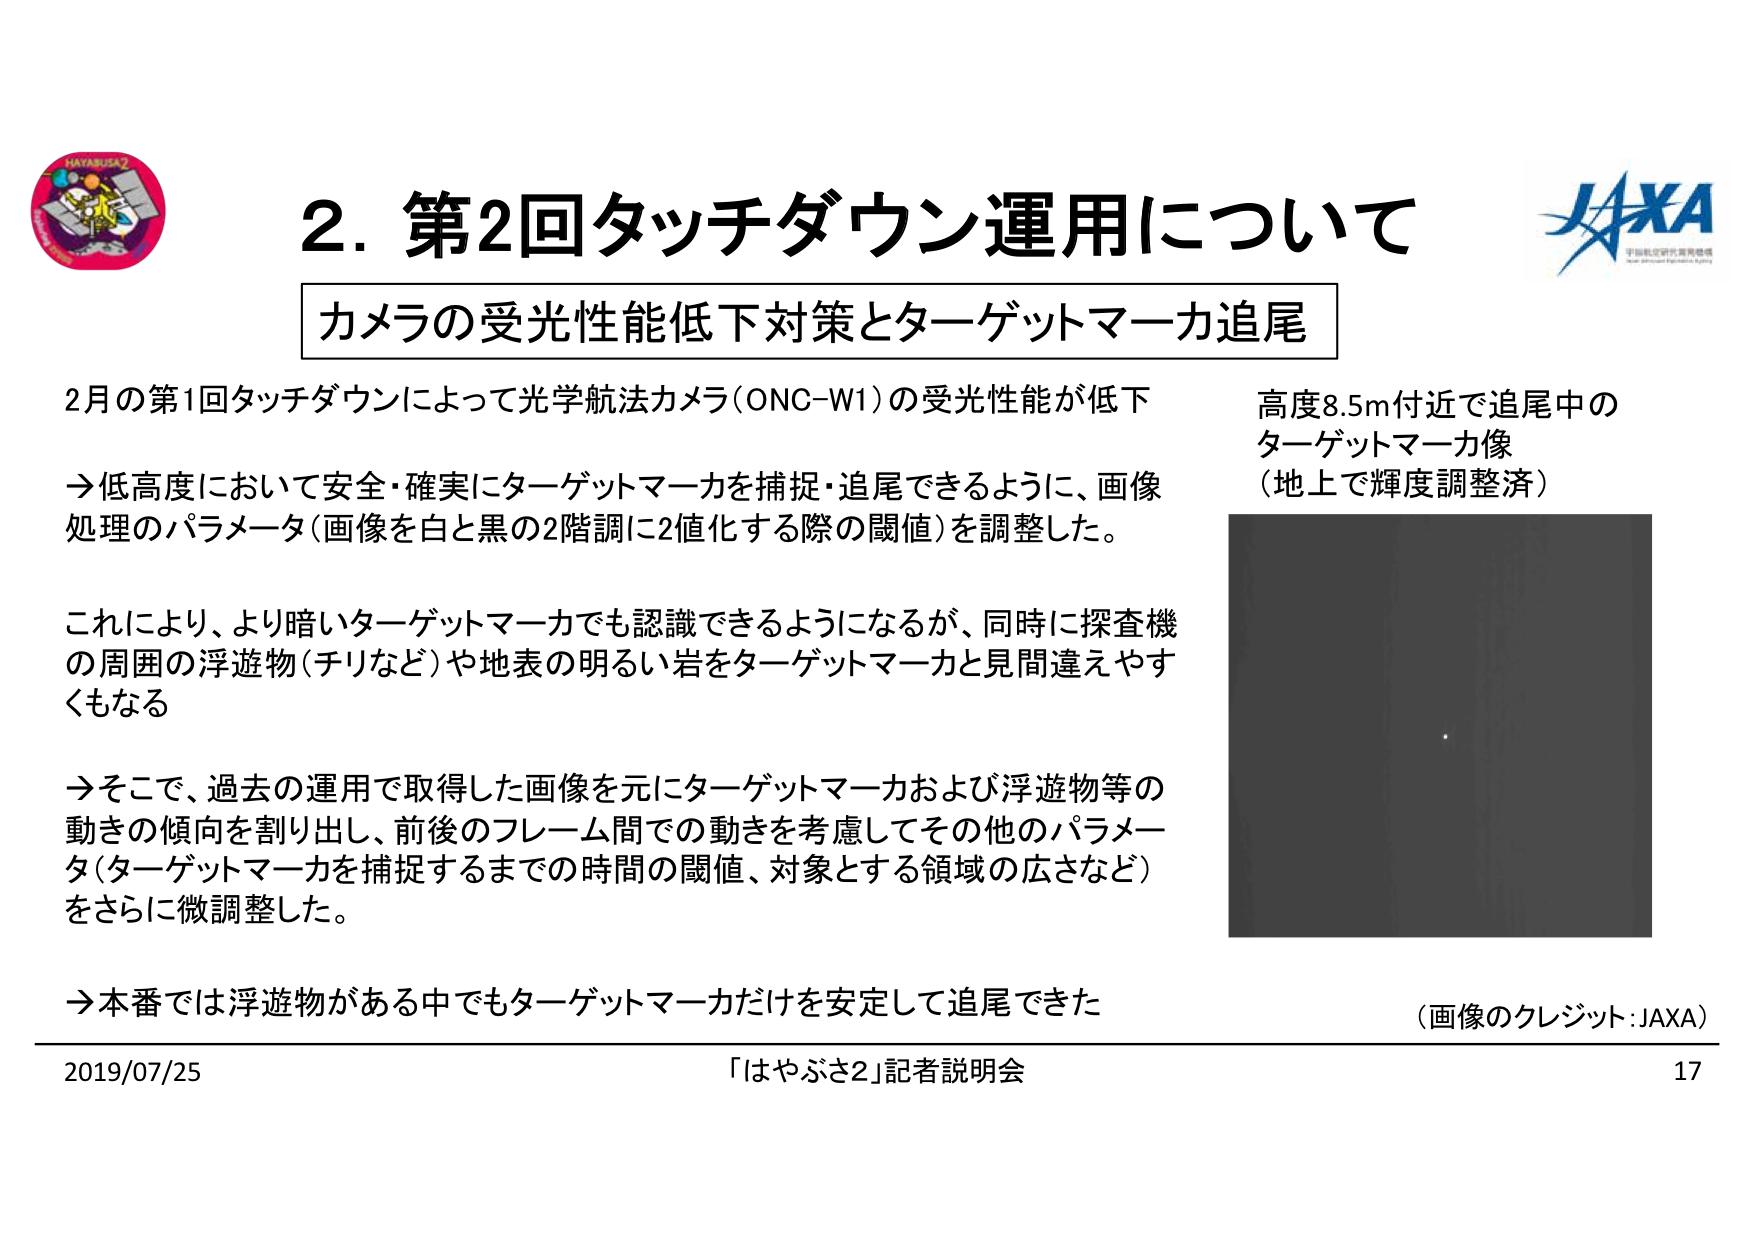 f:id:Imamura:20190725151221p:plain